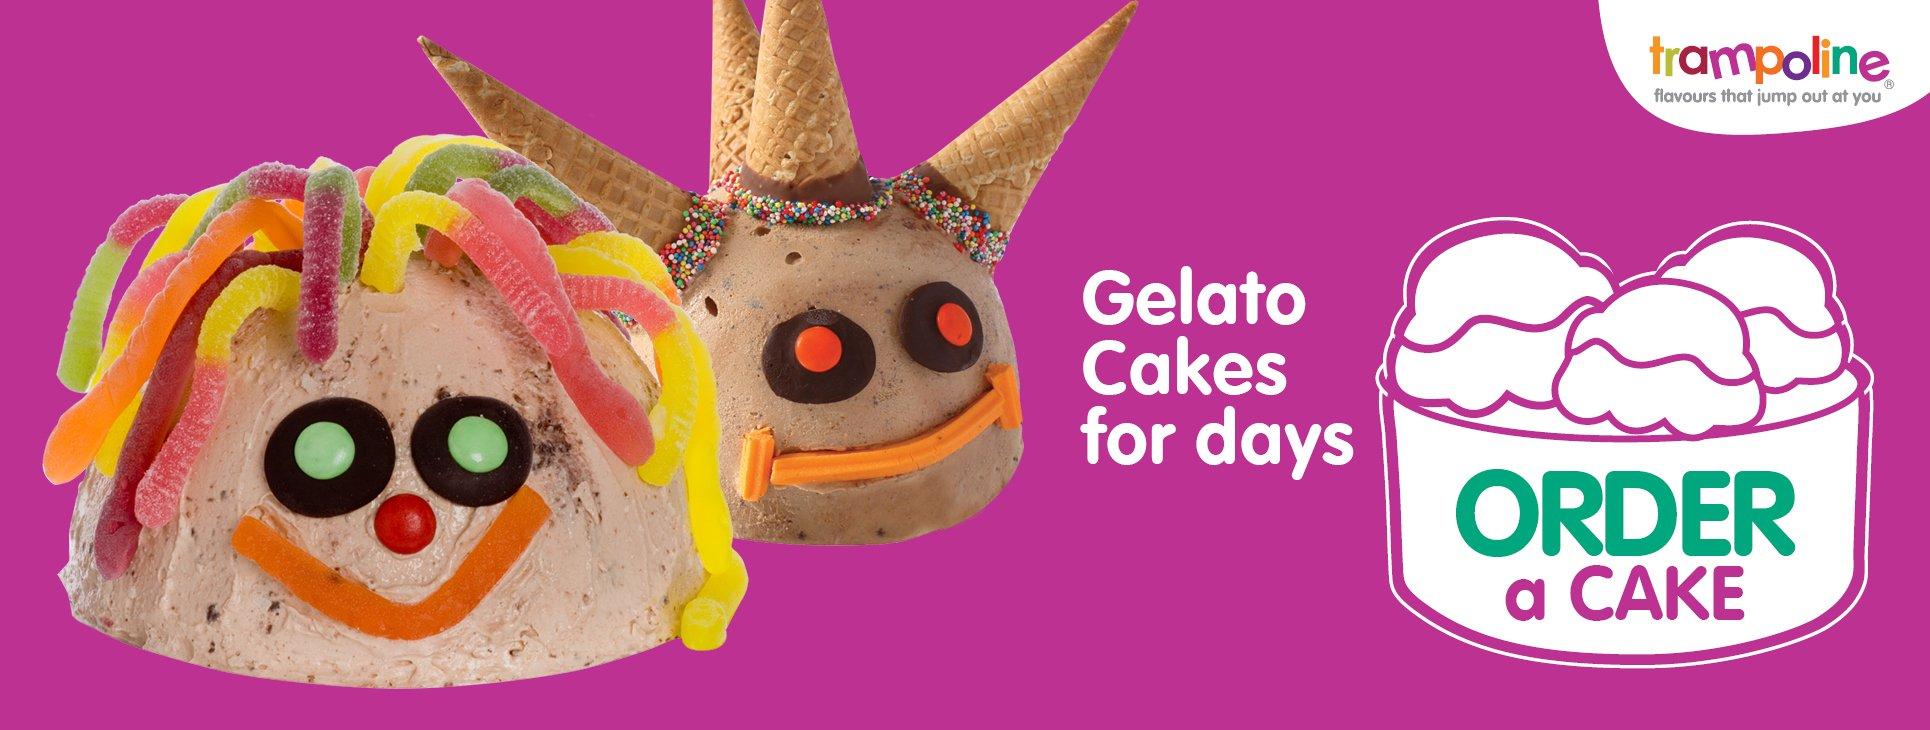 Tampoline Gelato Ice Cream Banner2